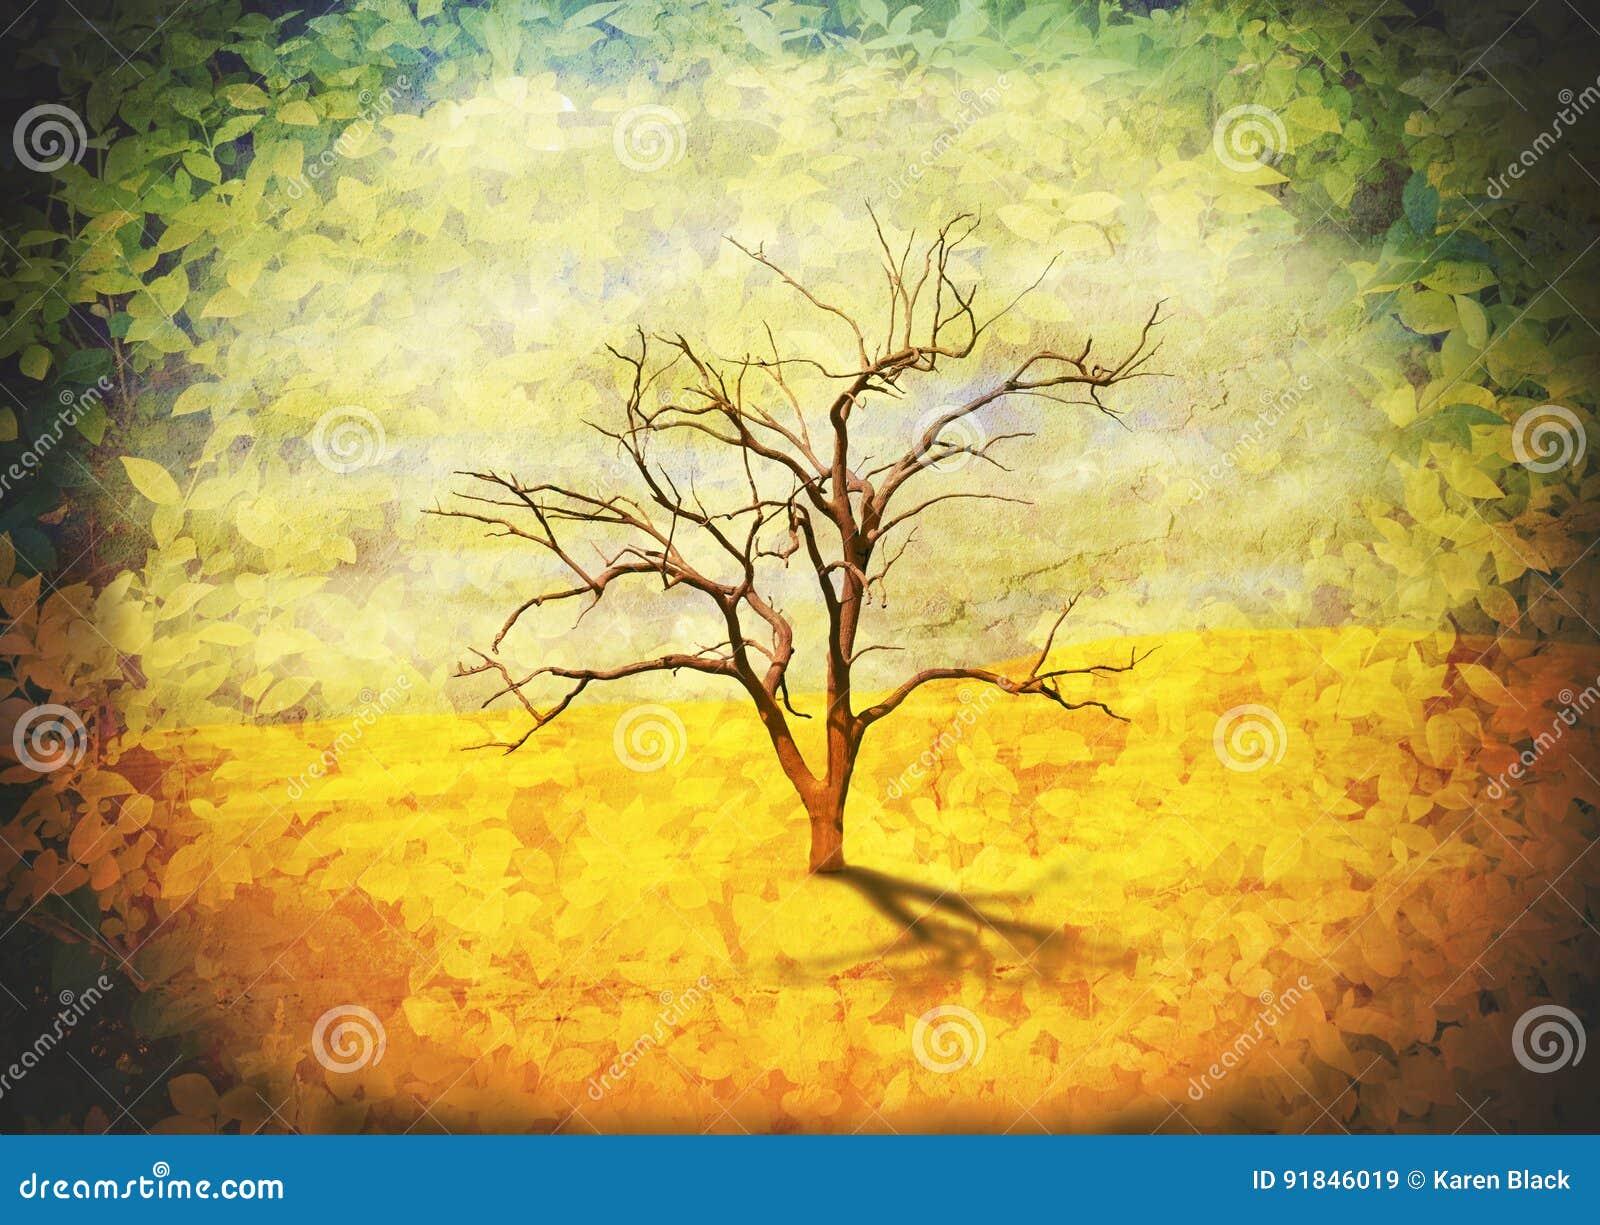 Leafless tree in desert landscape frame by leaves